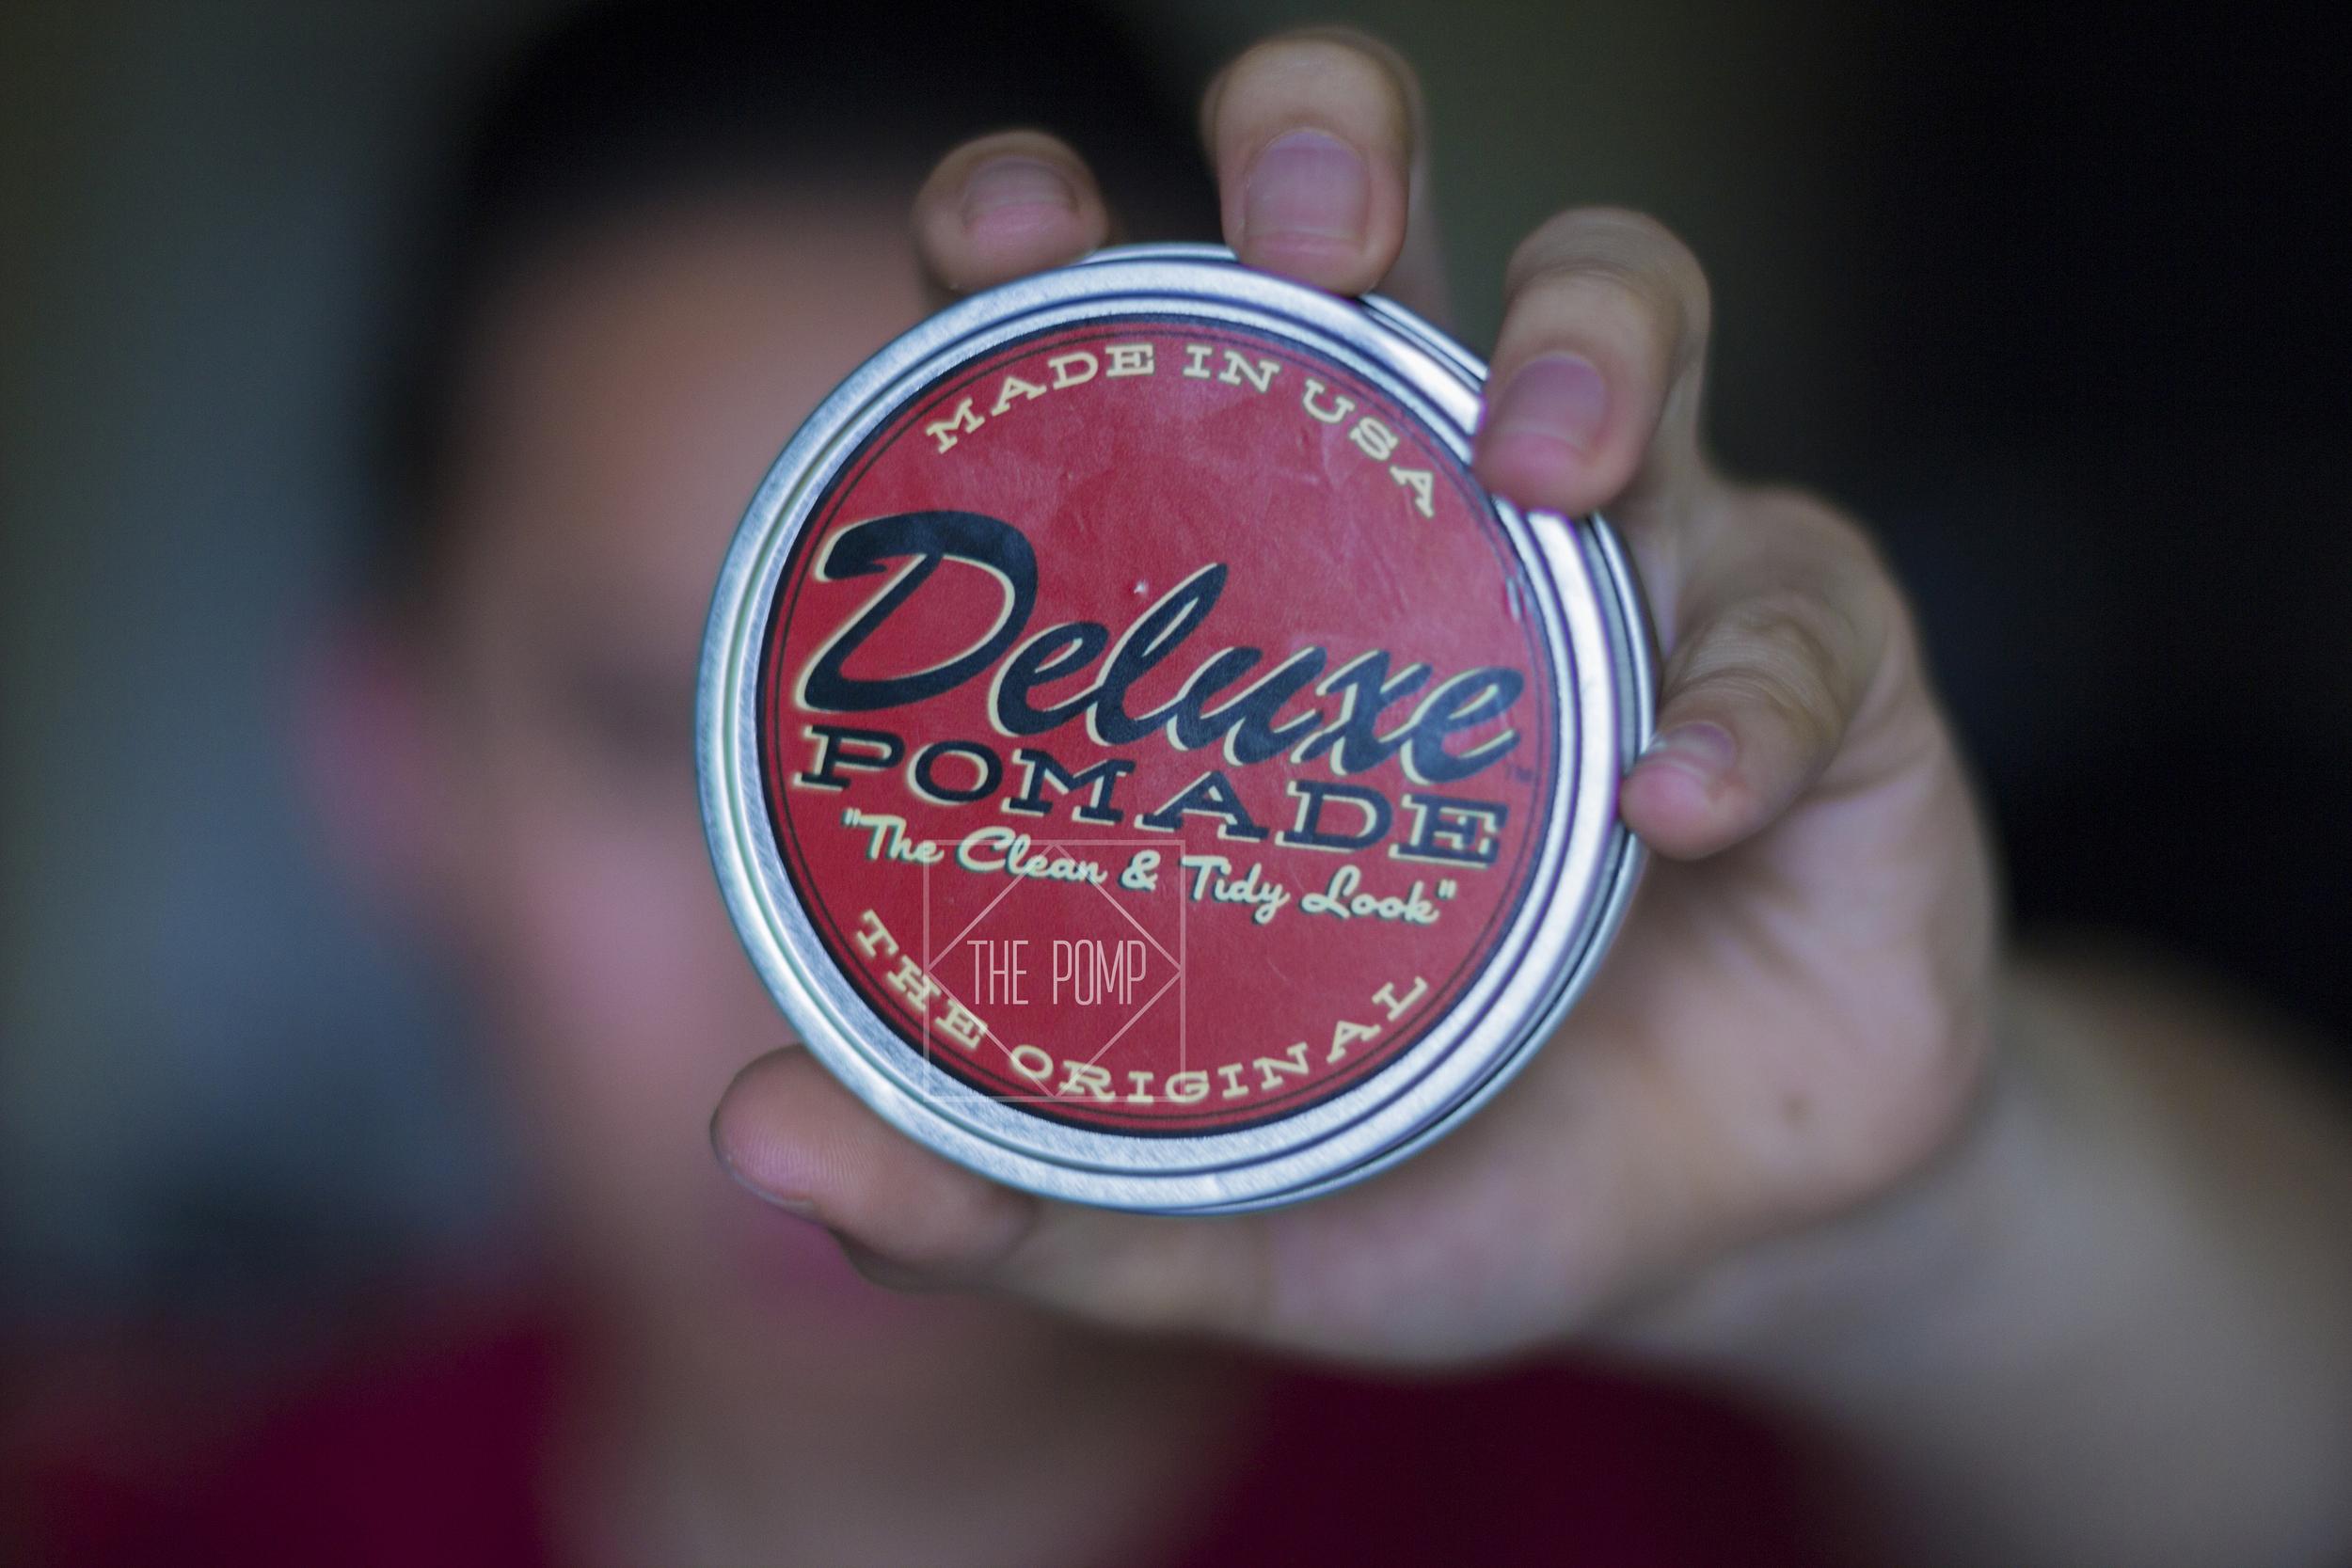 Deluxe Pomade jar